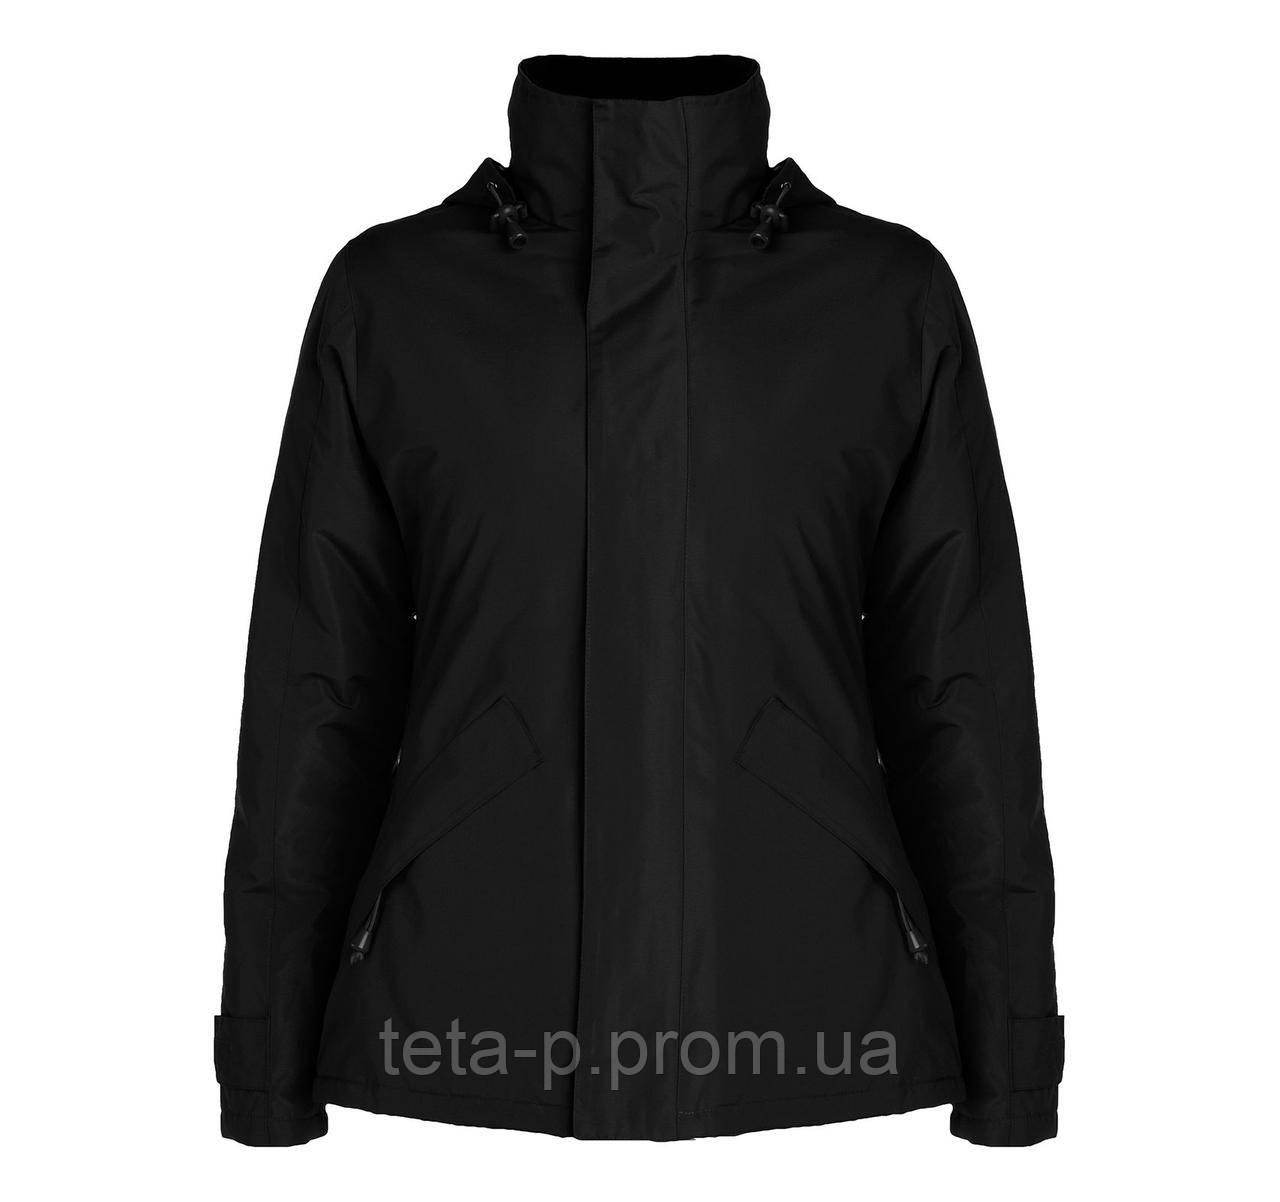 Куртка Europa женская